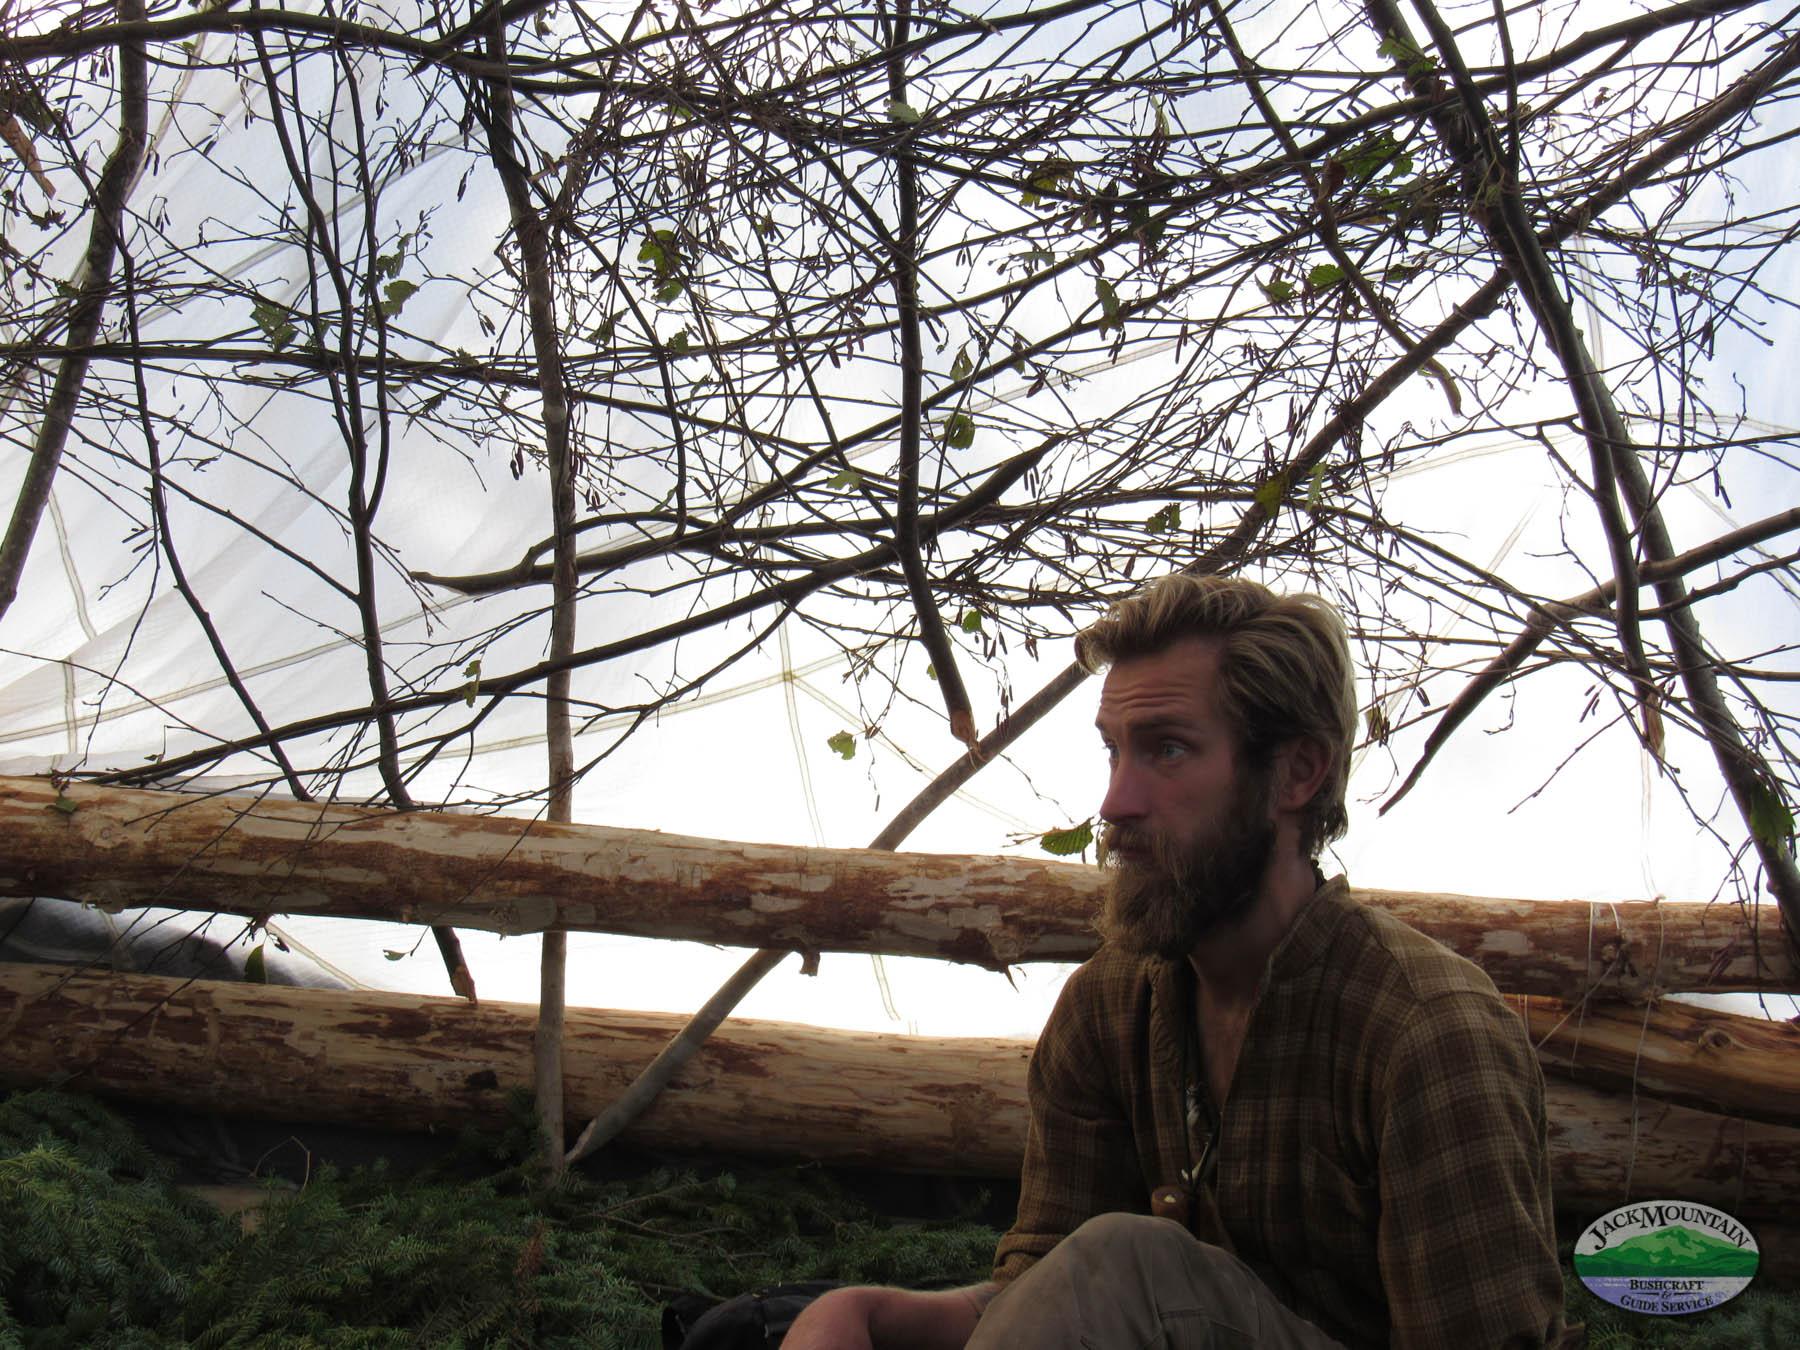 Group Shelter Building For The Fall 2020 Bushcraft Semester | JMB Vlog 120